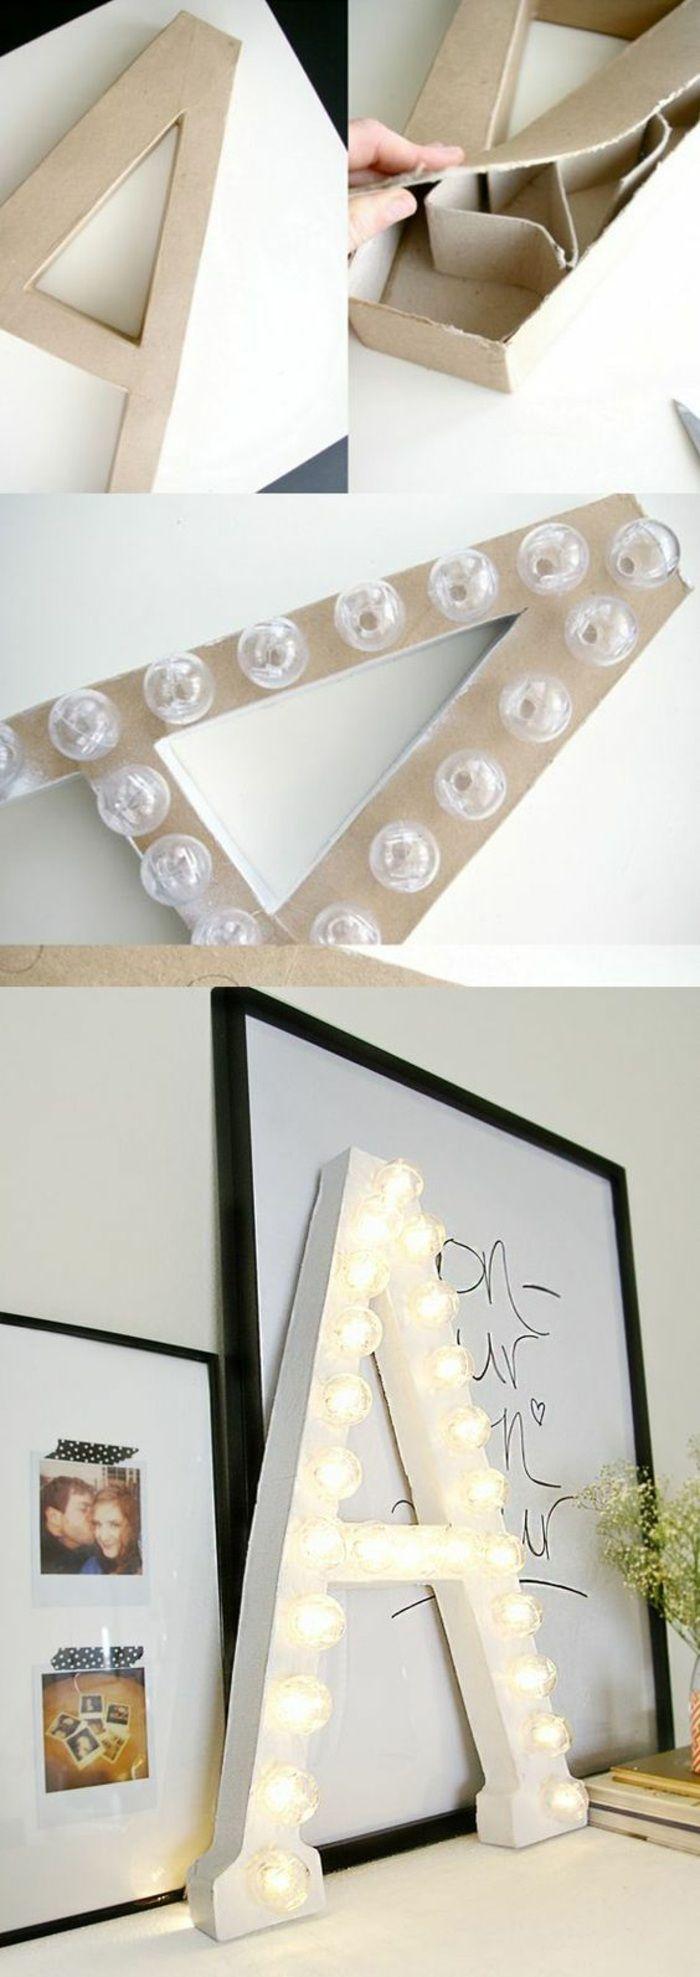 Inspirational wanddeko gro er papp buchstabe gl hbirnen lampe bilder